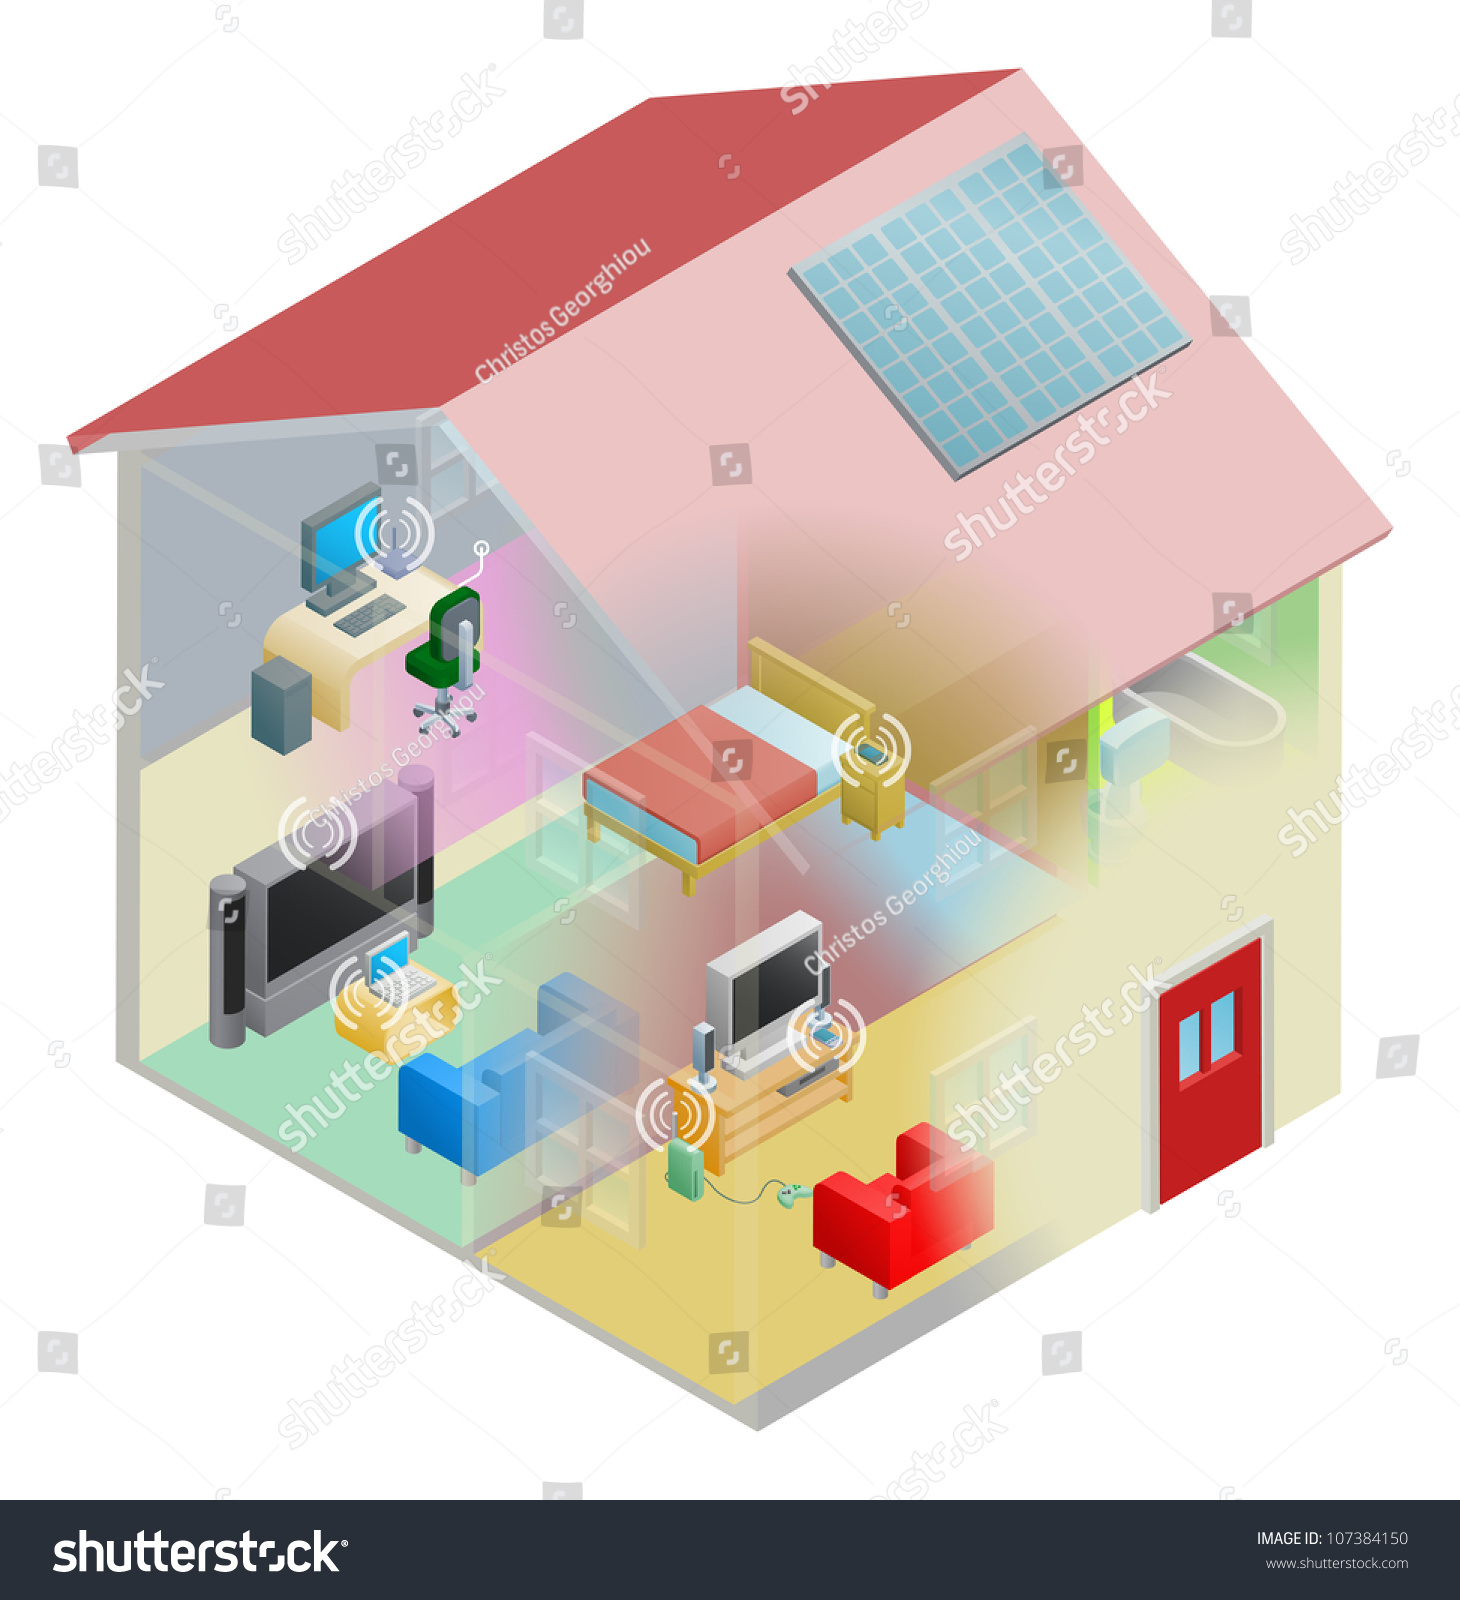 home internet network wireless computing devices stock vector a home internet network wireless and computing devices connected in a home group local area